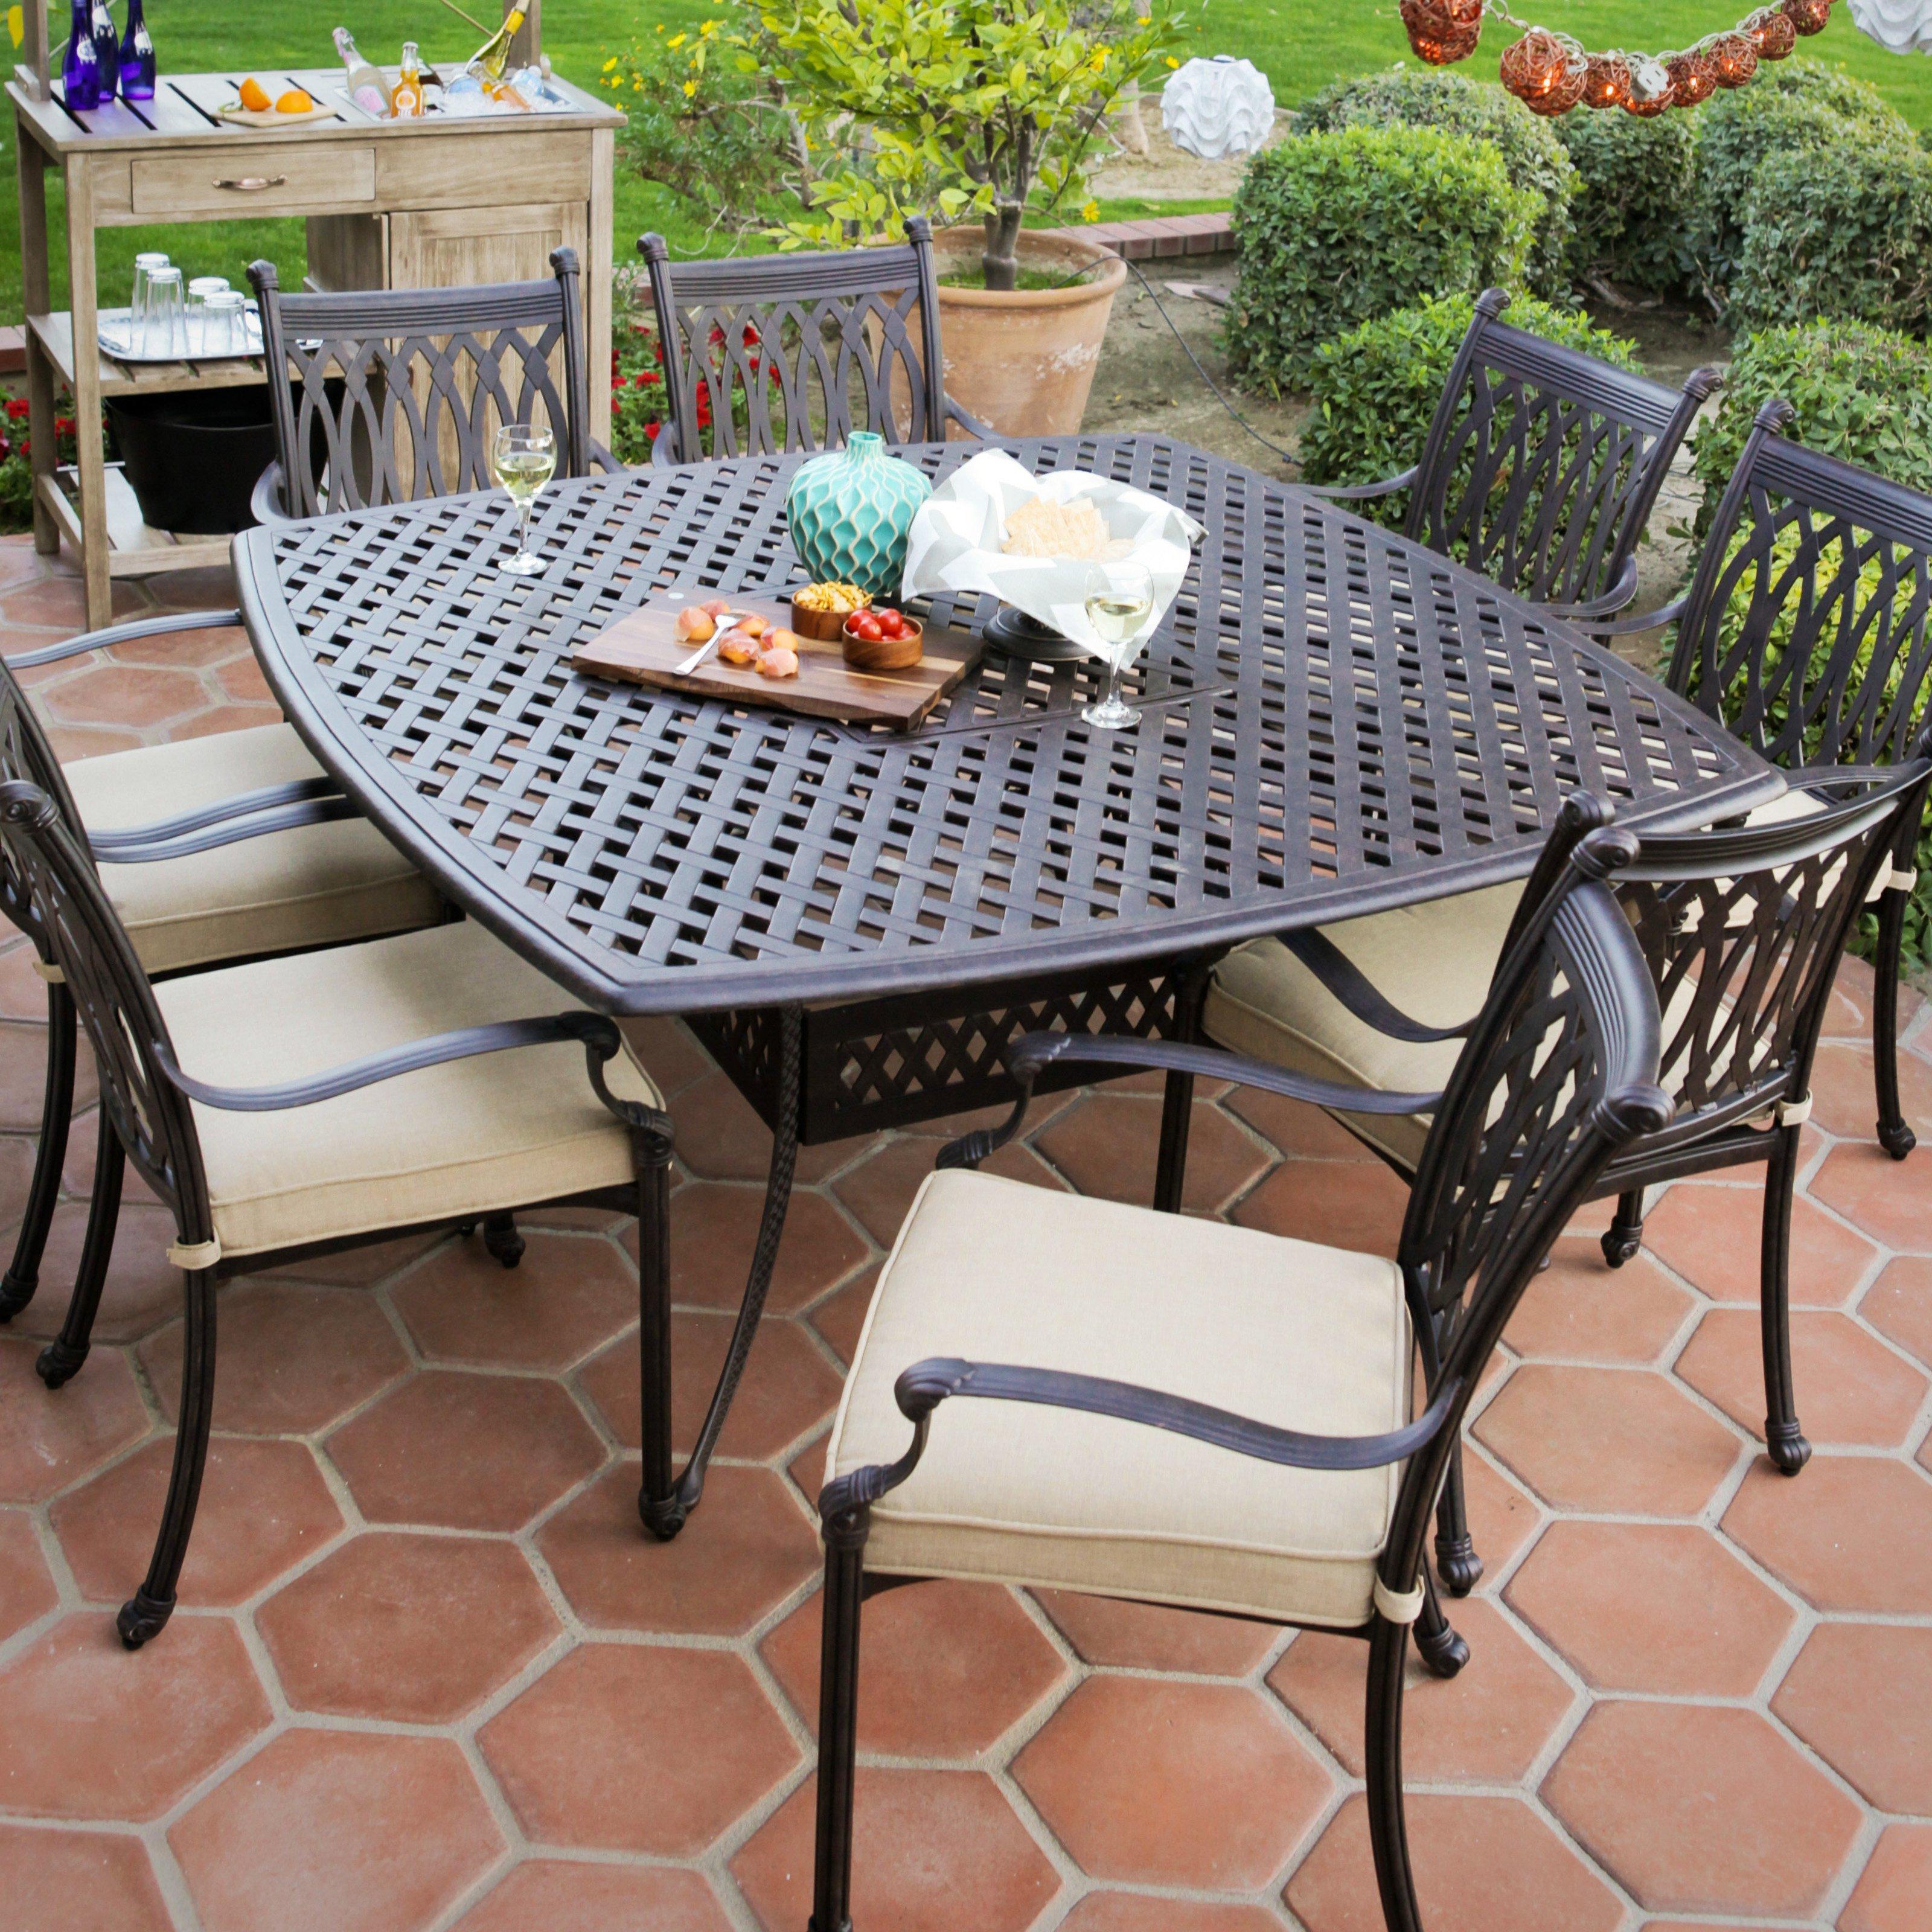 Terracotta Tiles Industry in Pakistan Red bricks ceramic flooring tiles design price images